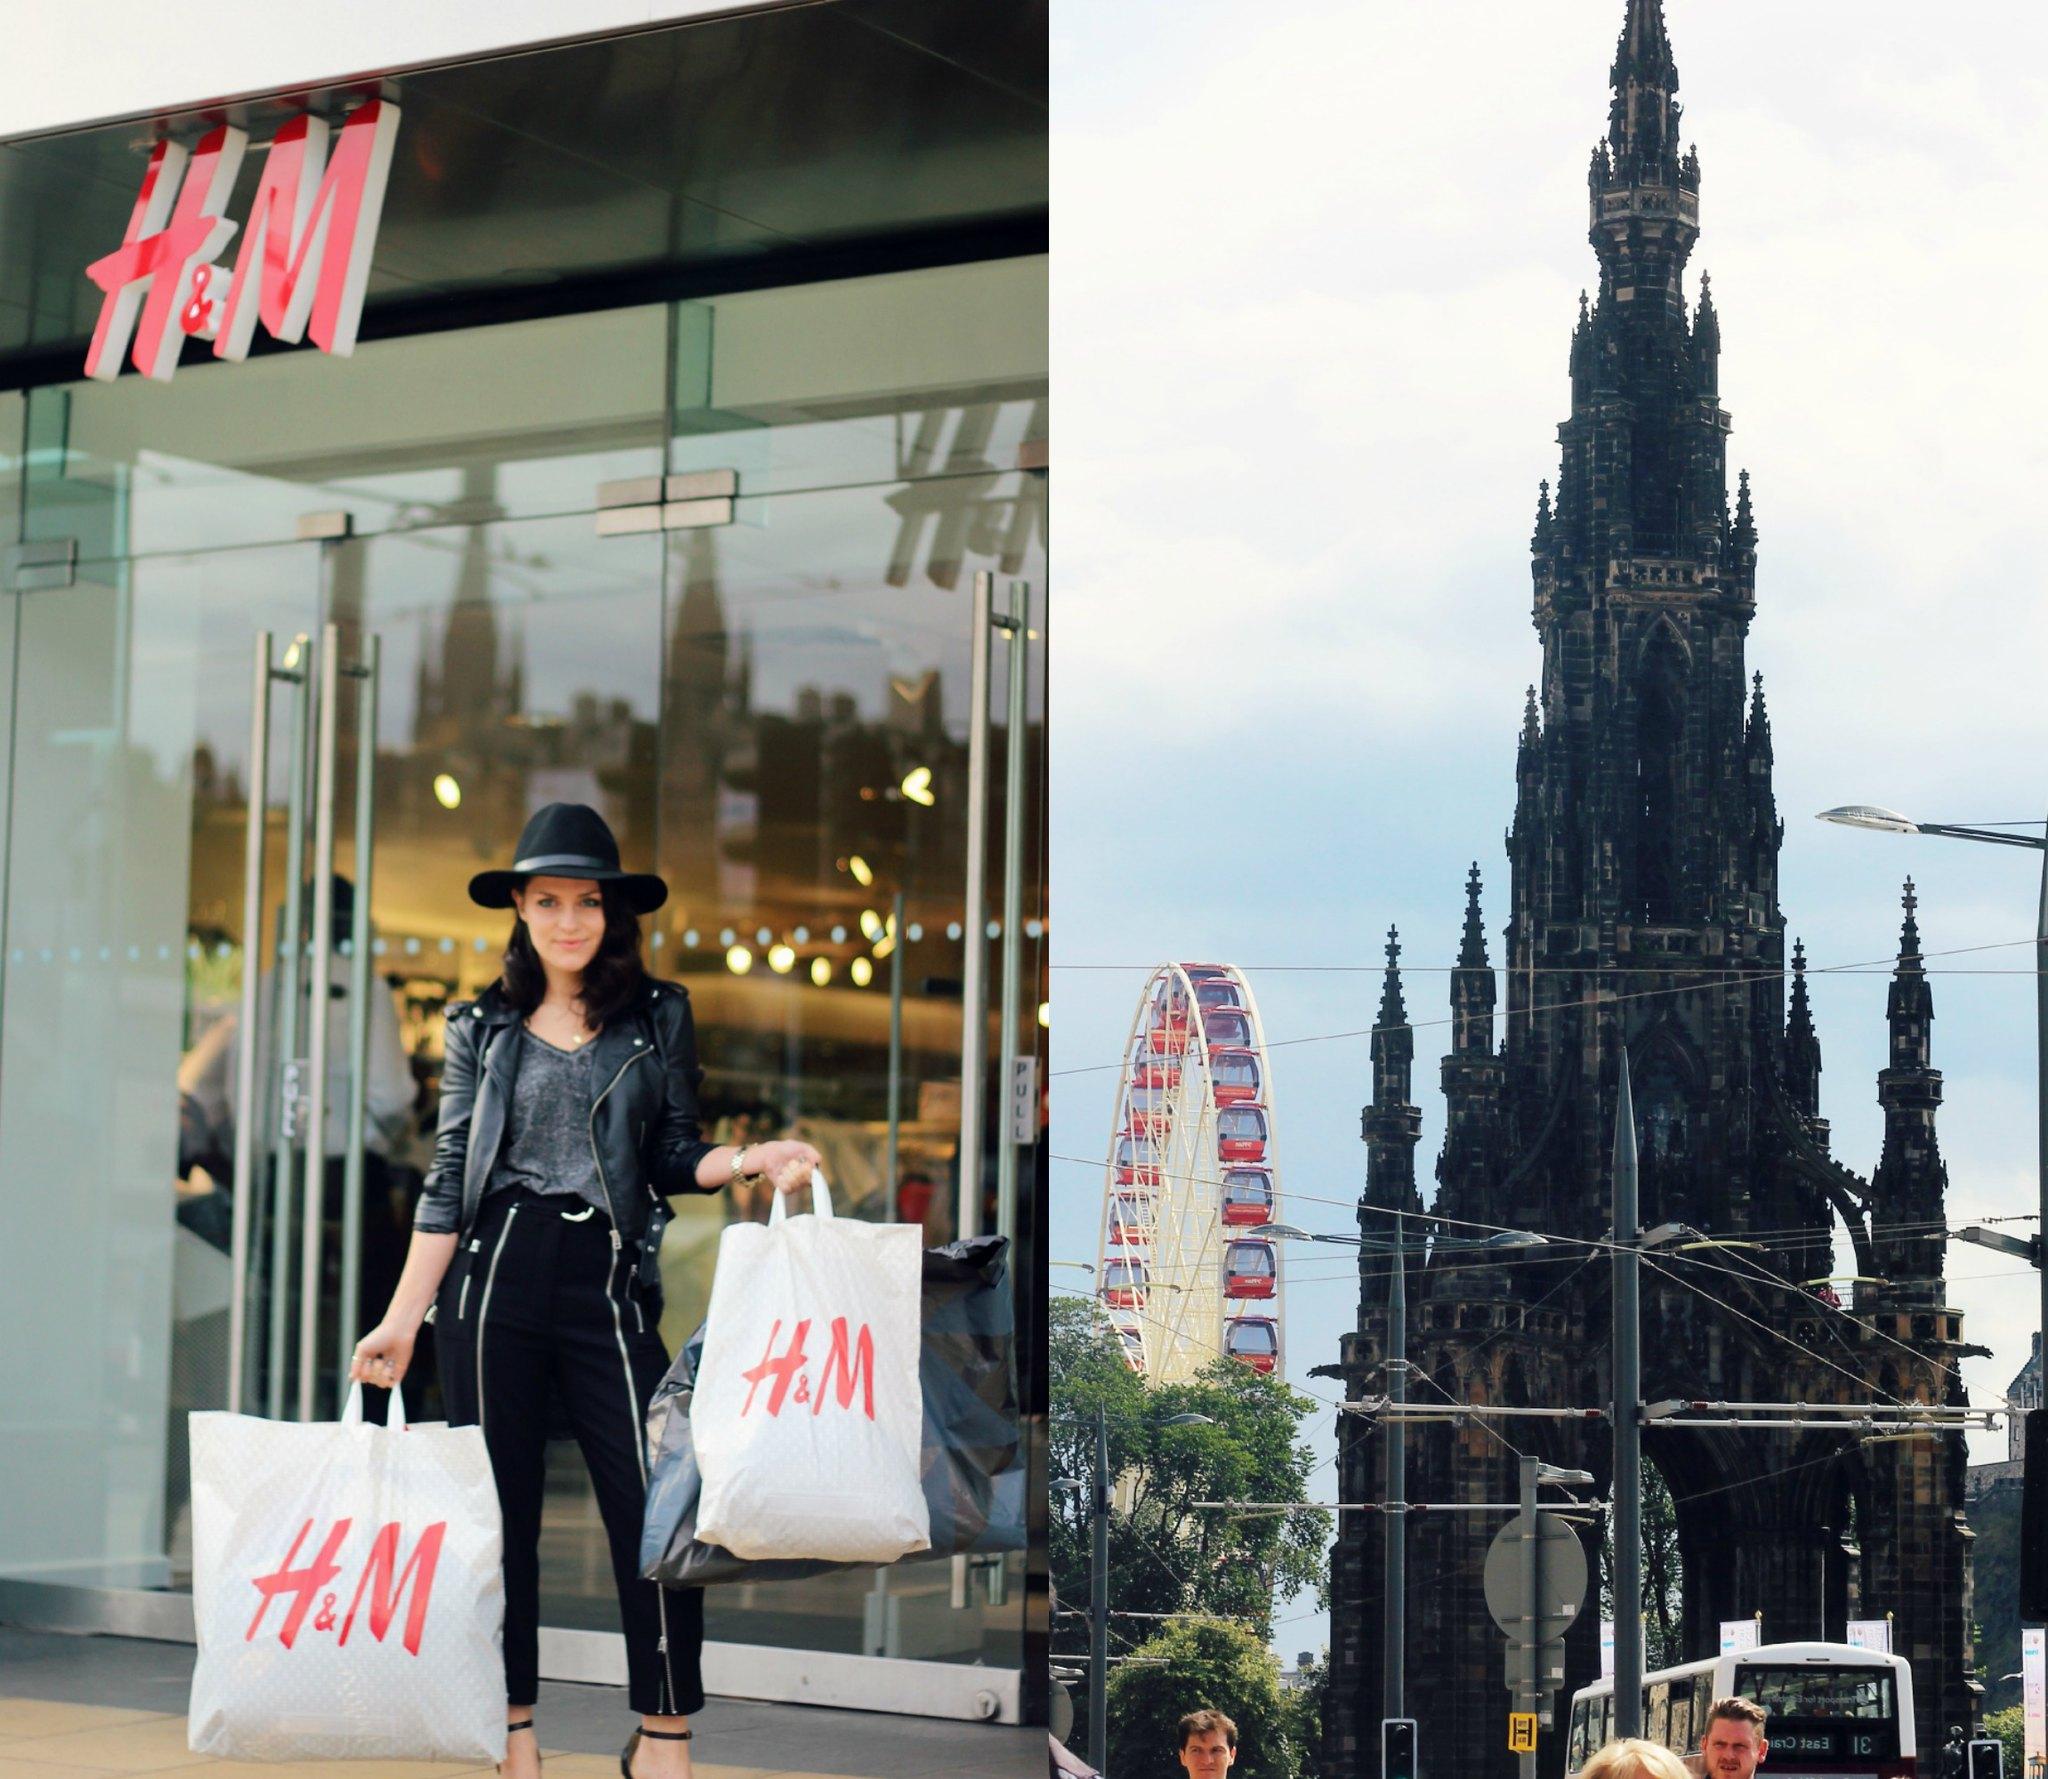 HM Edinburgh store launch 20